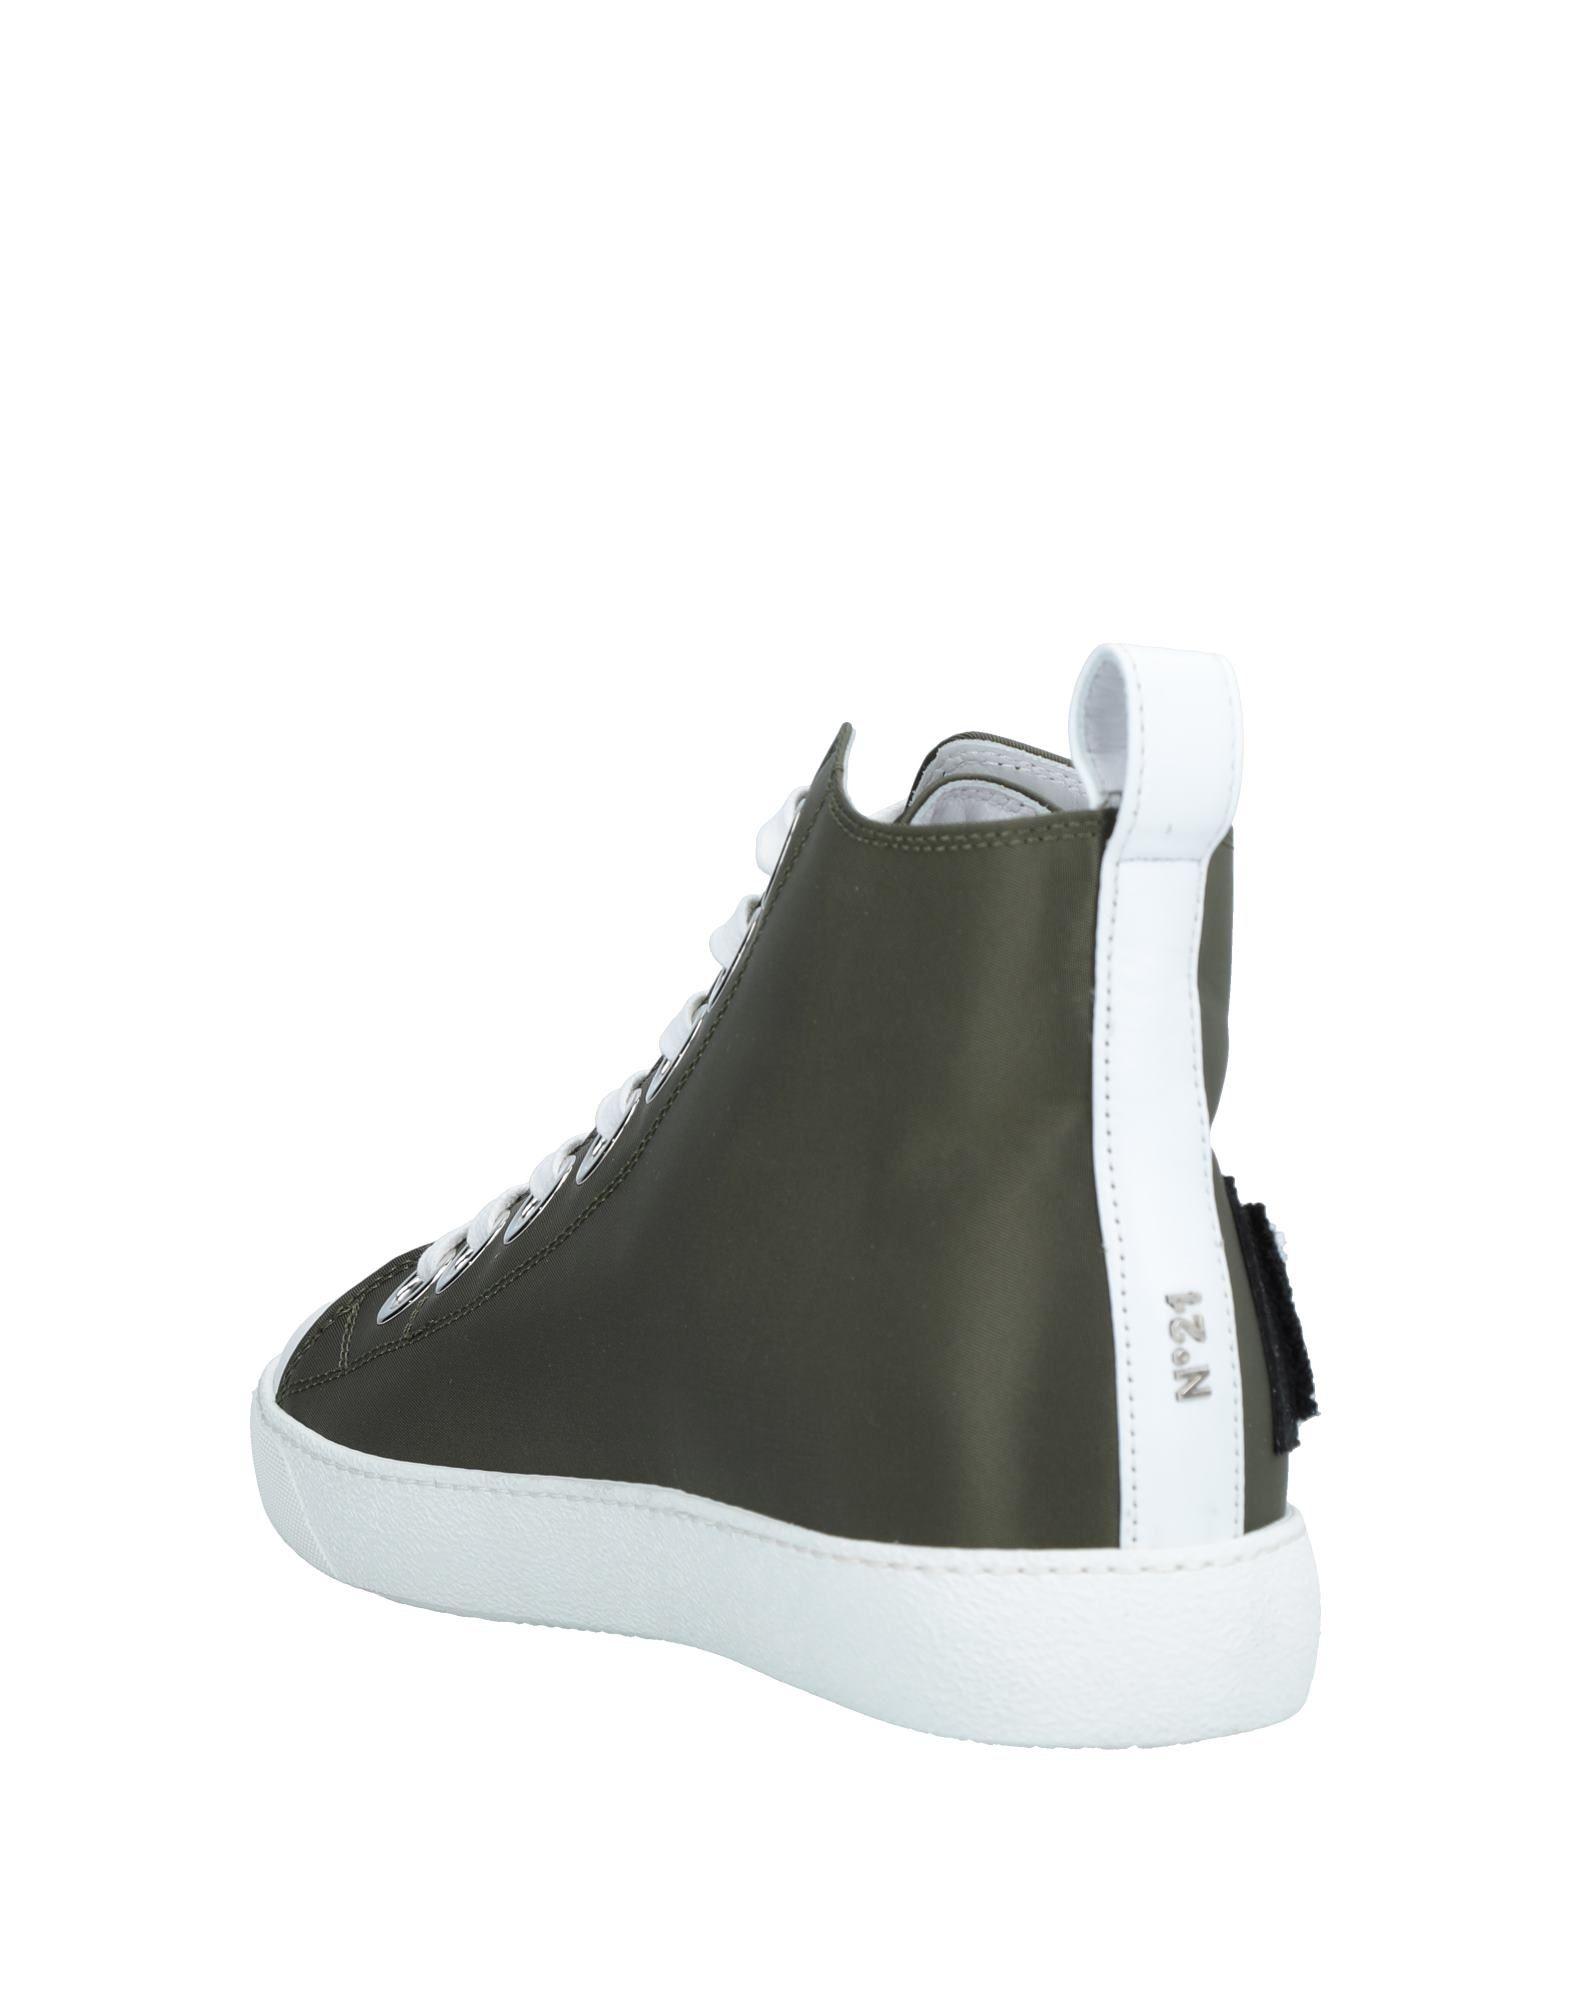 N° N° N° 21 Sneakers Herren  11533372OO da1f21